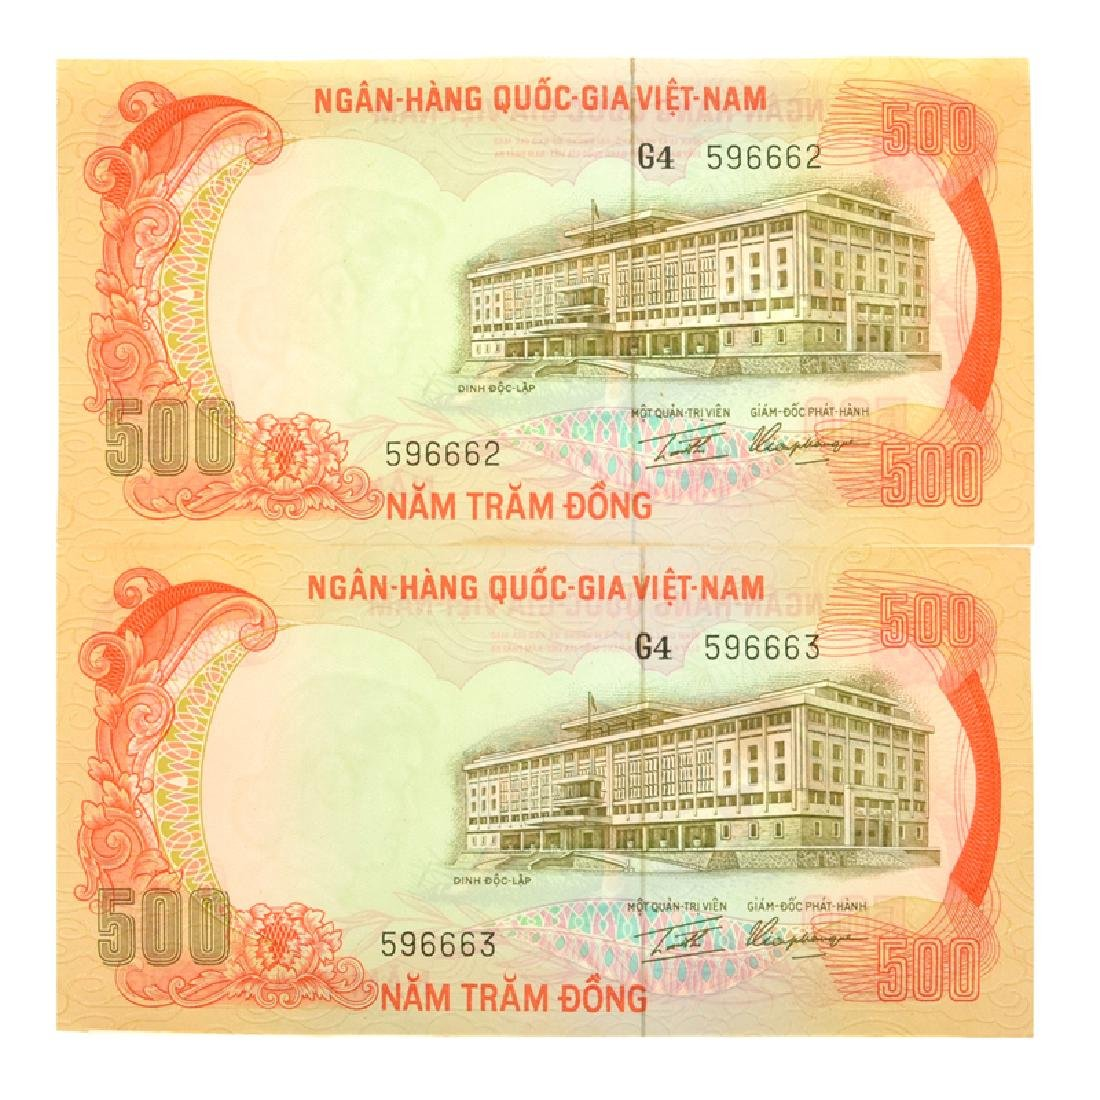 Vietnam South P33a 500 Dong Banknotes (2) - 2